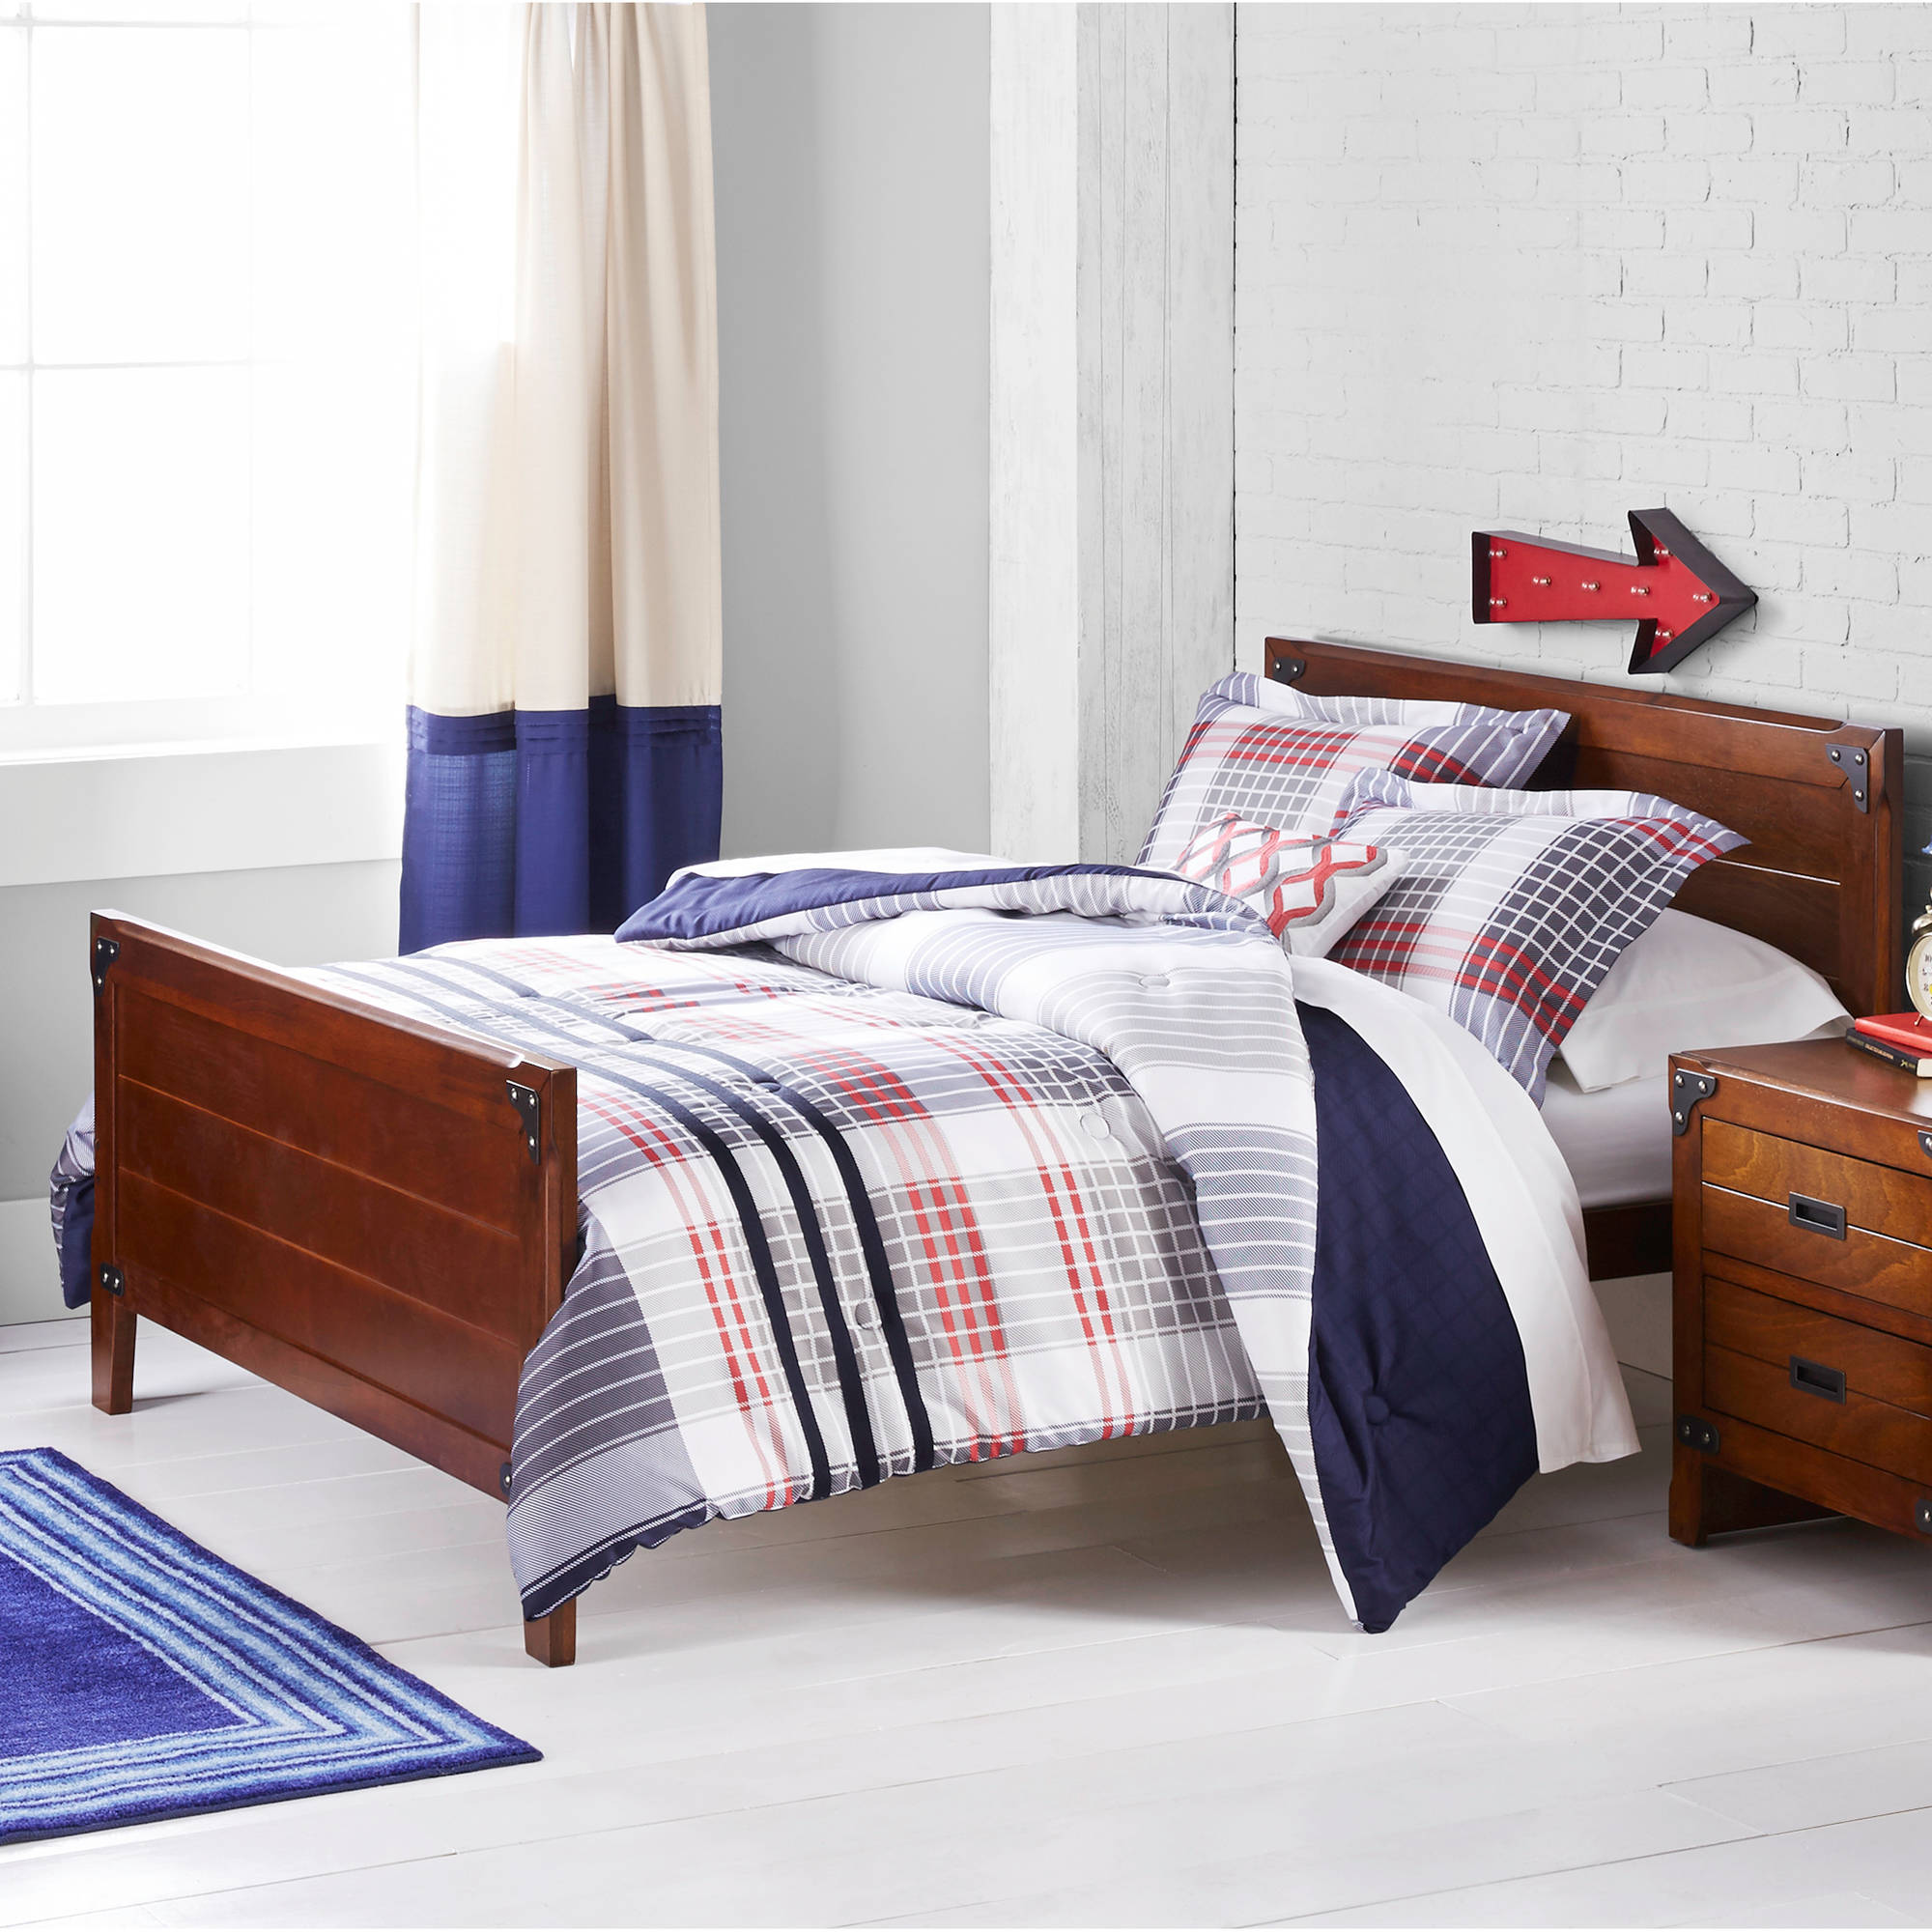 Better Homes and Gardens Kids Navy Plaid Bedding Comforter Set